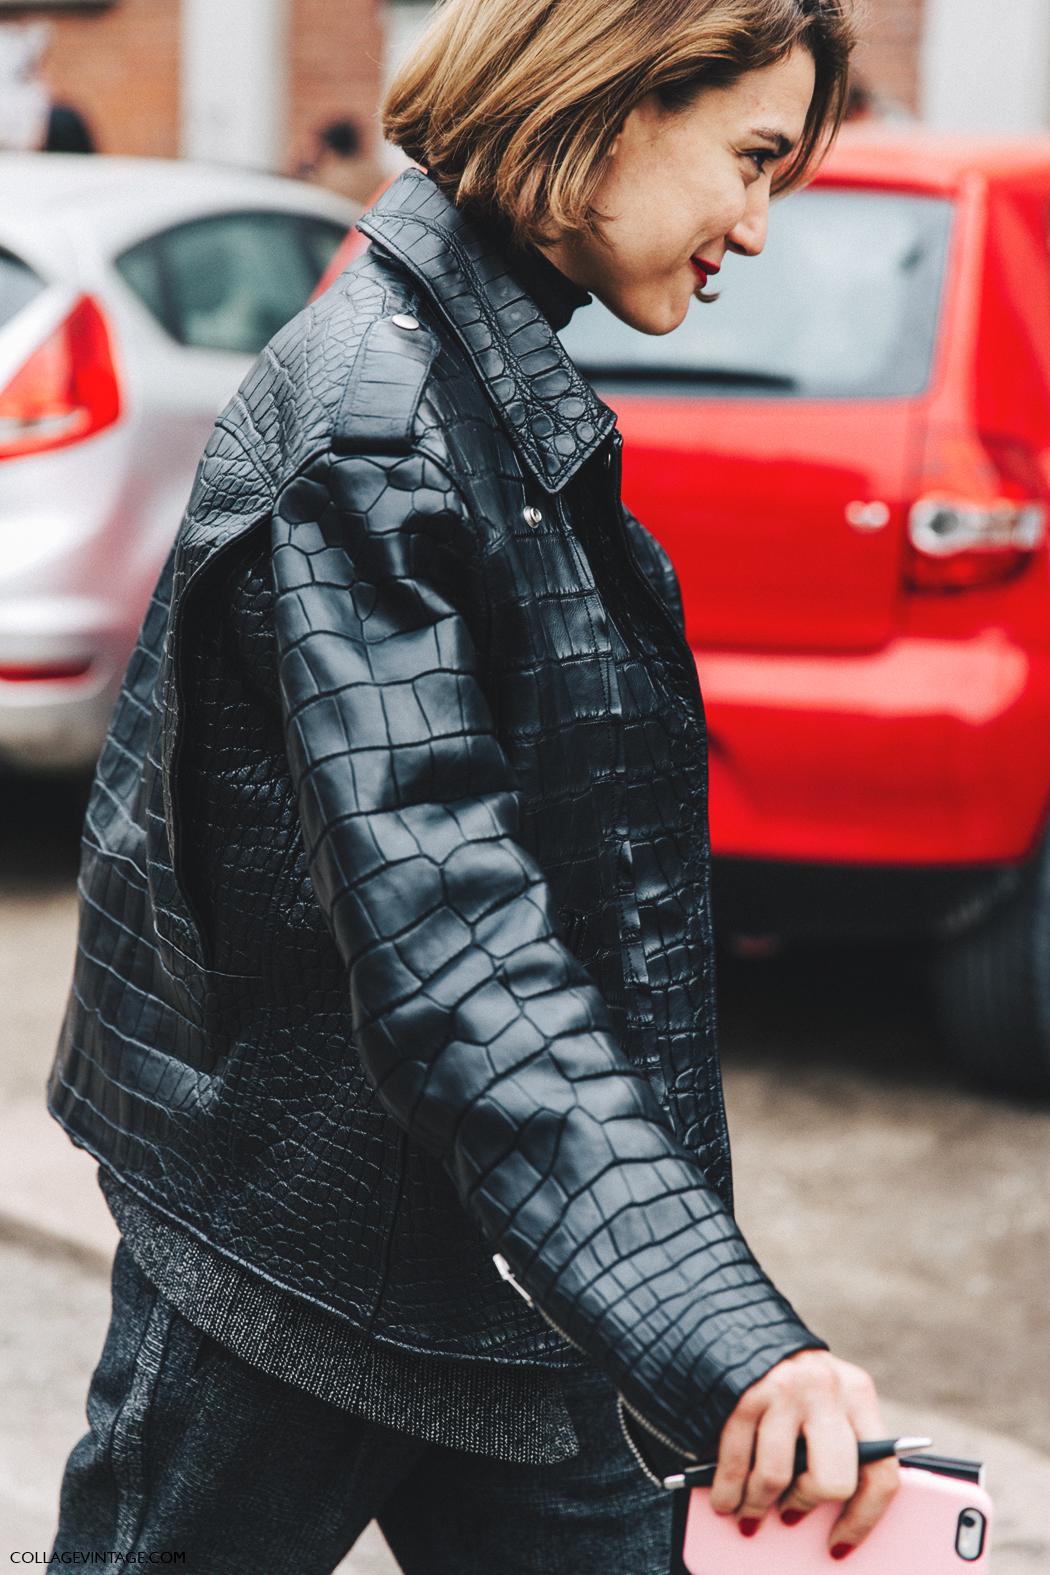 Milan_Fashion_Week_Fall_16-MFW-Street_Style-Collage_Vintage-Coco_Leather_Biker_Jacket-